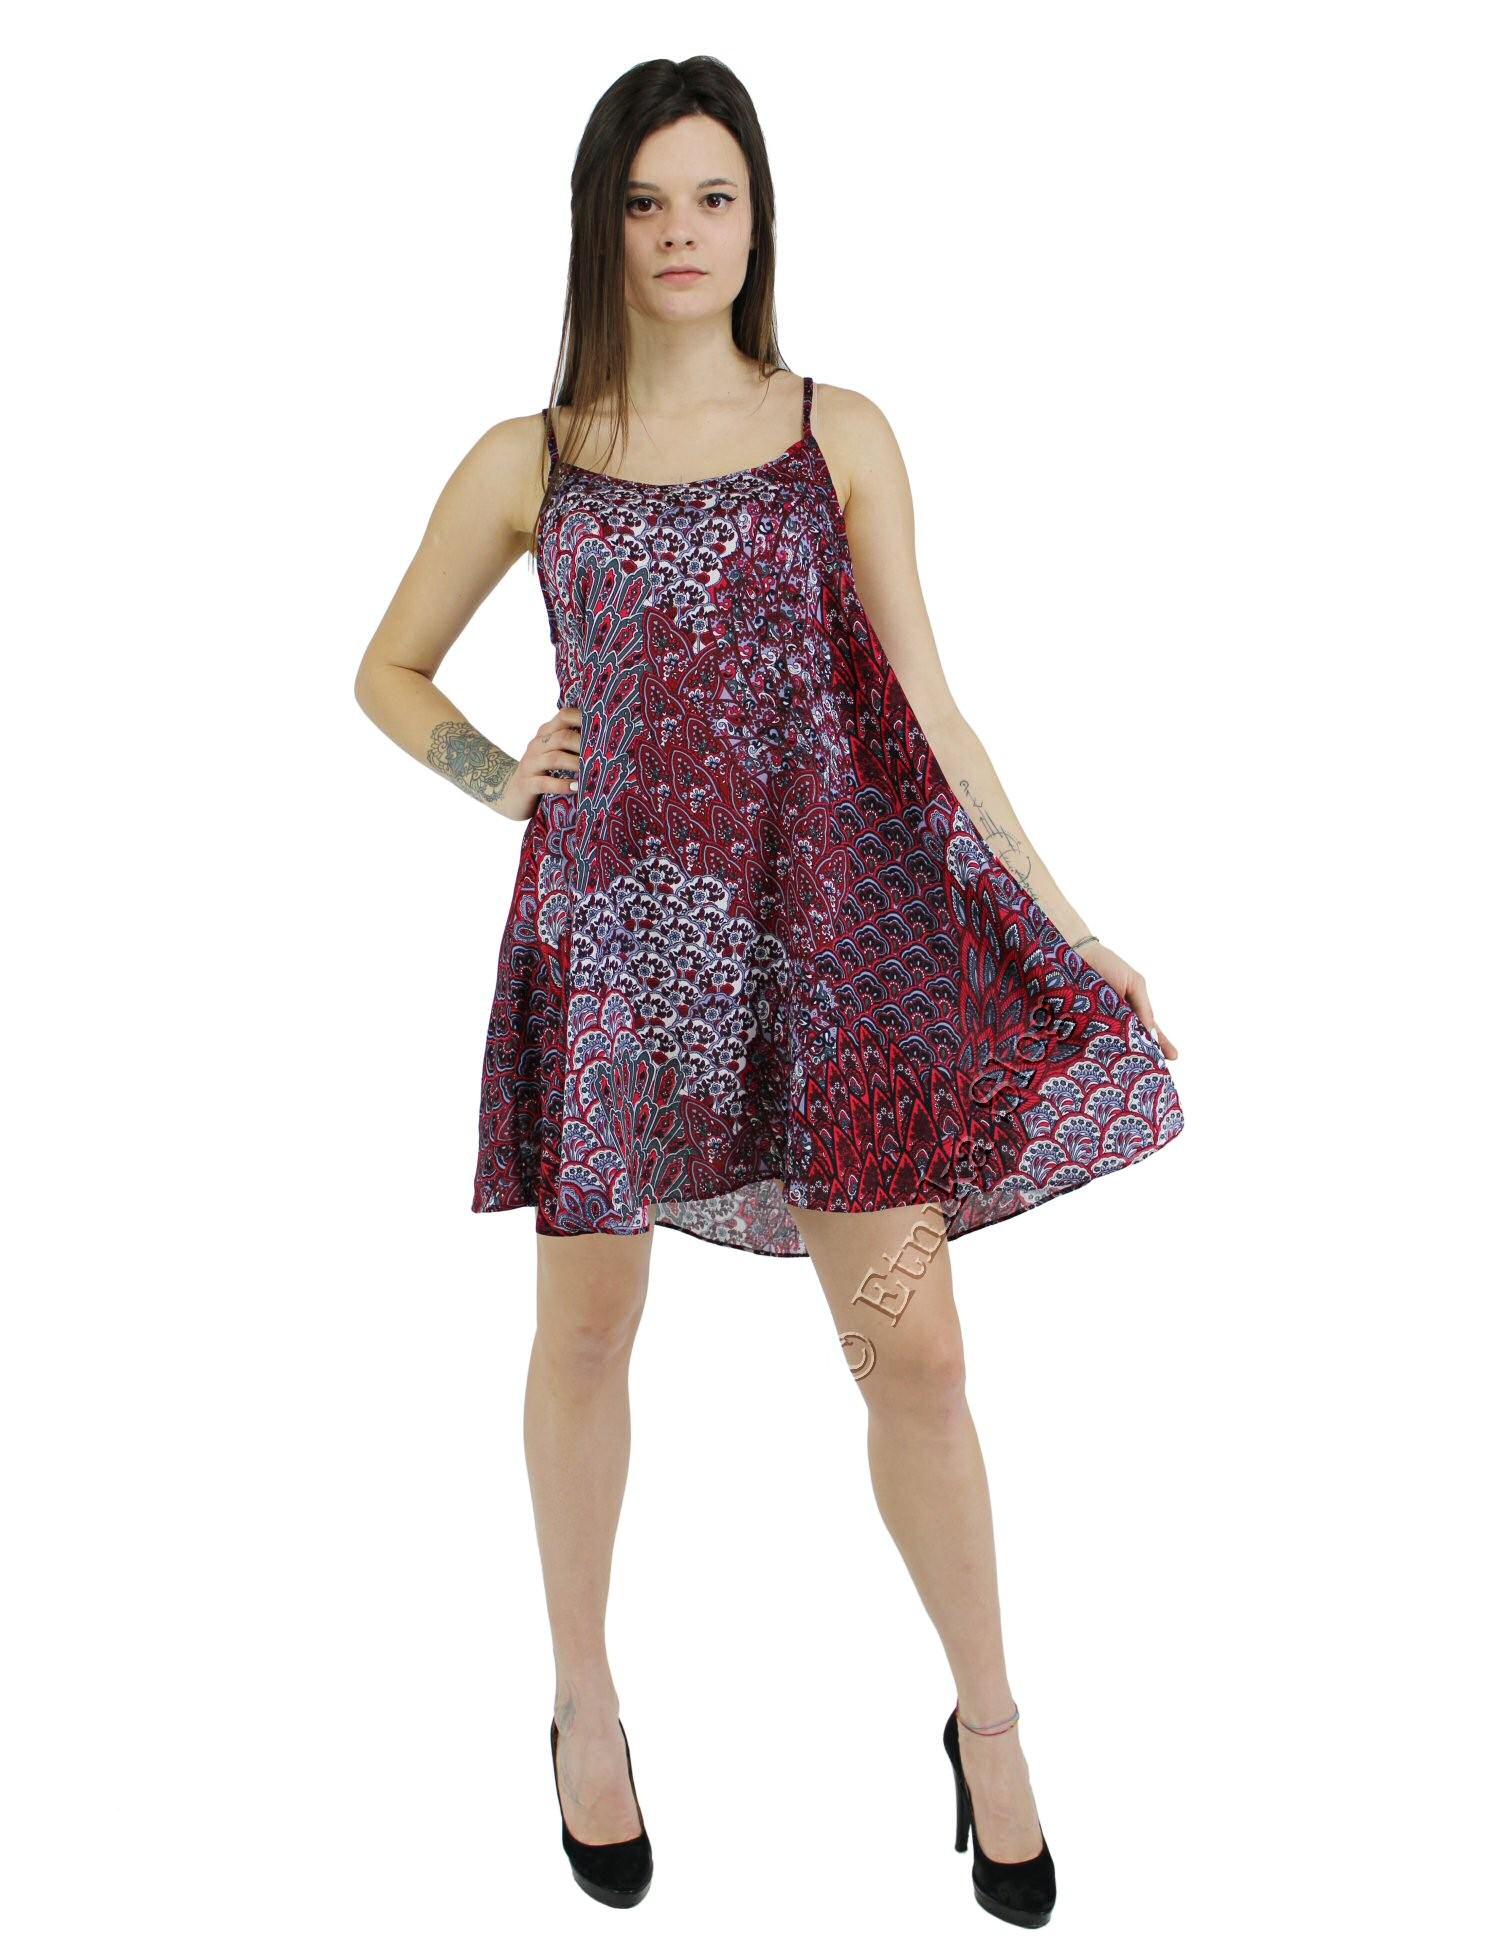 VISCOSE SUMMER DRESSES AB-BCV07DD - Etnika Slog d.o.o.